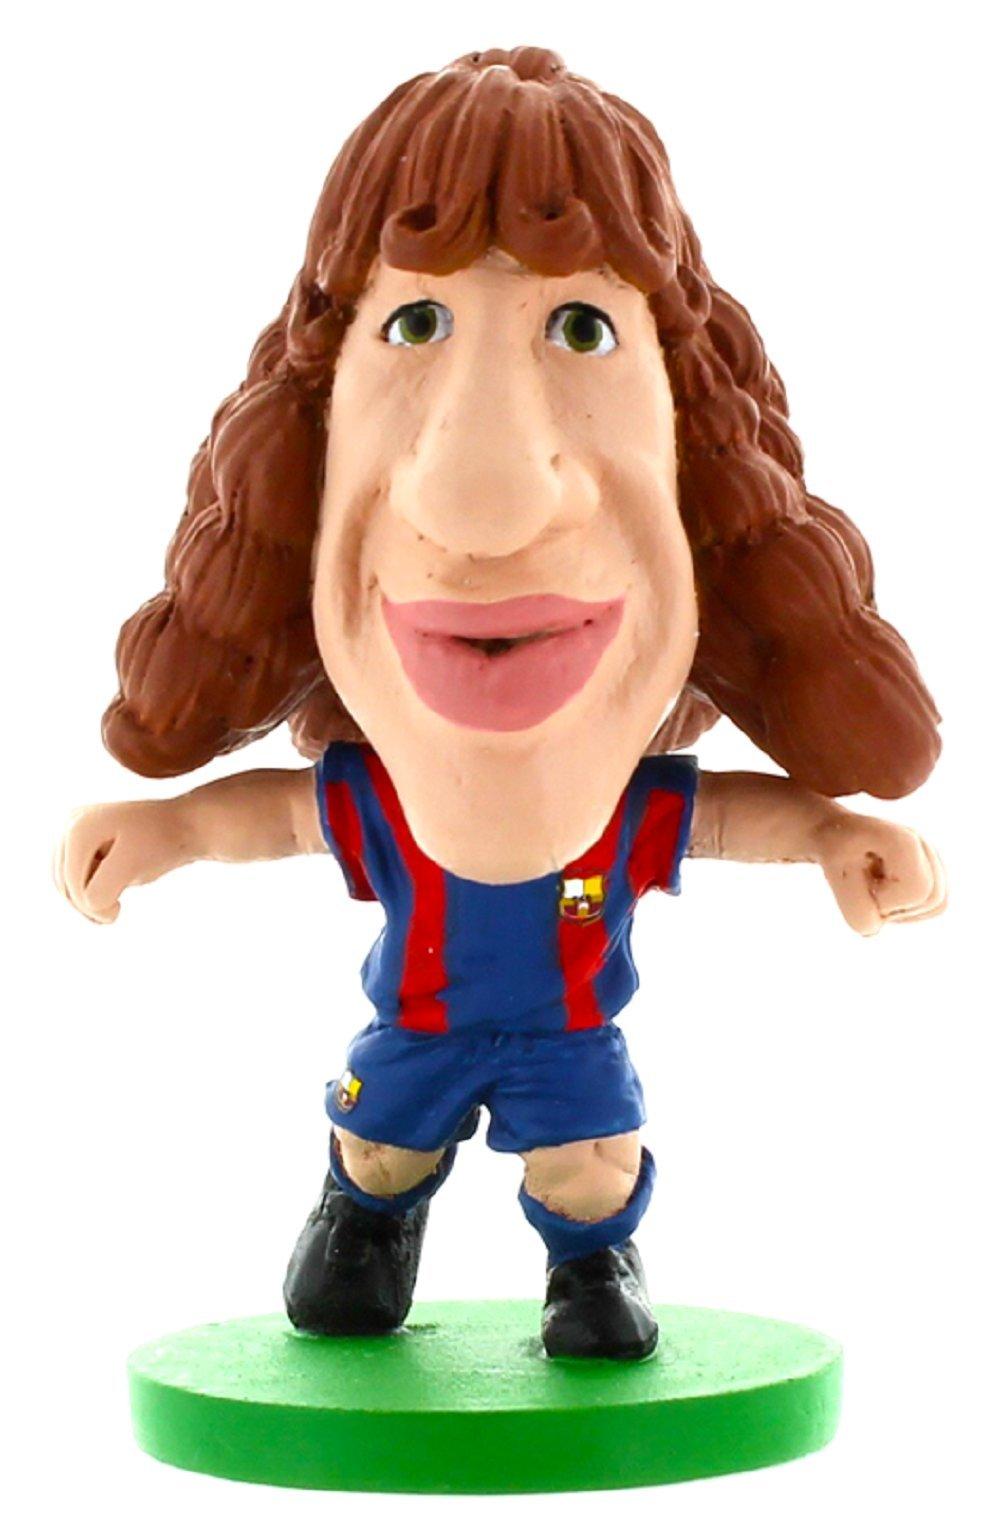 SoccerStarz Barca Toon Carles Puyol Home Kit